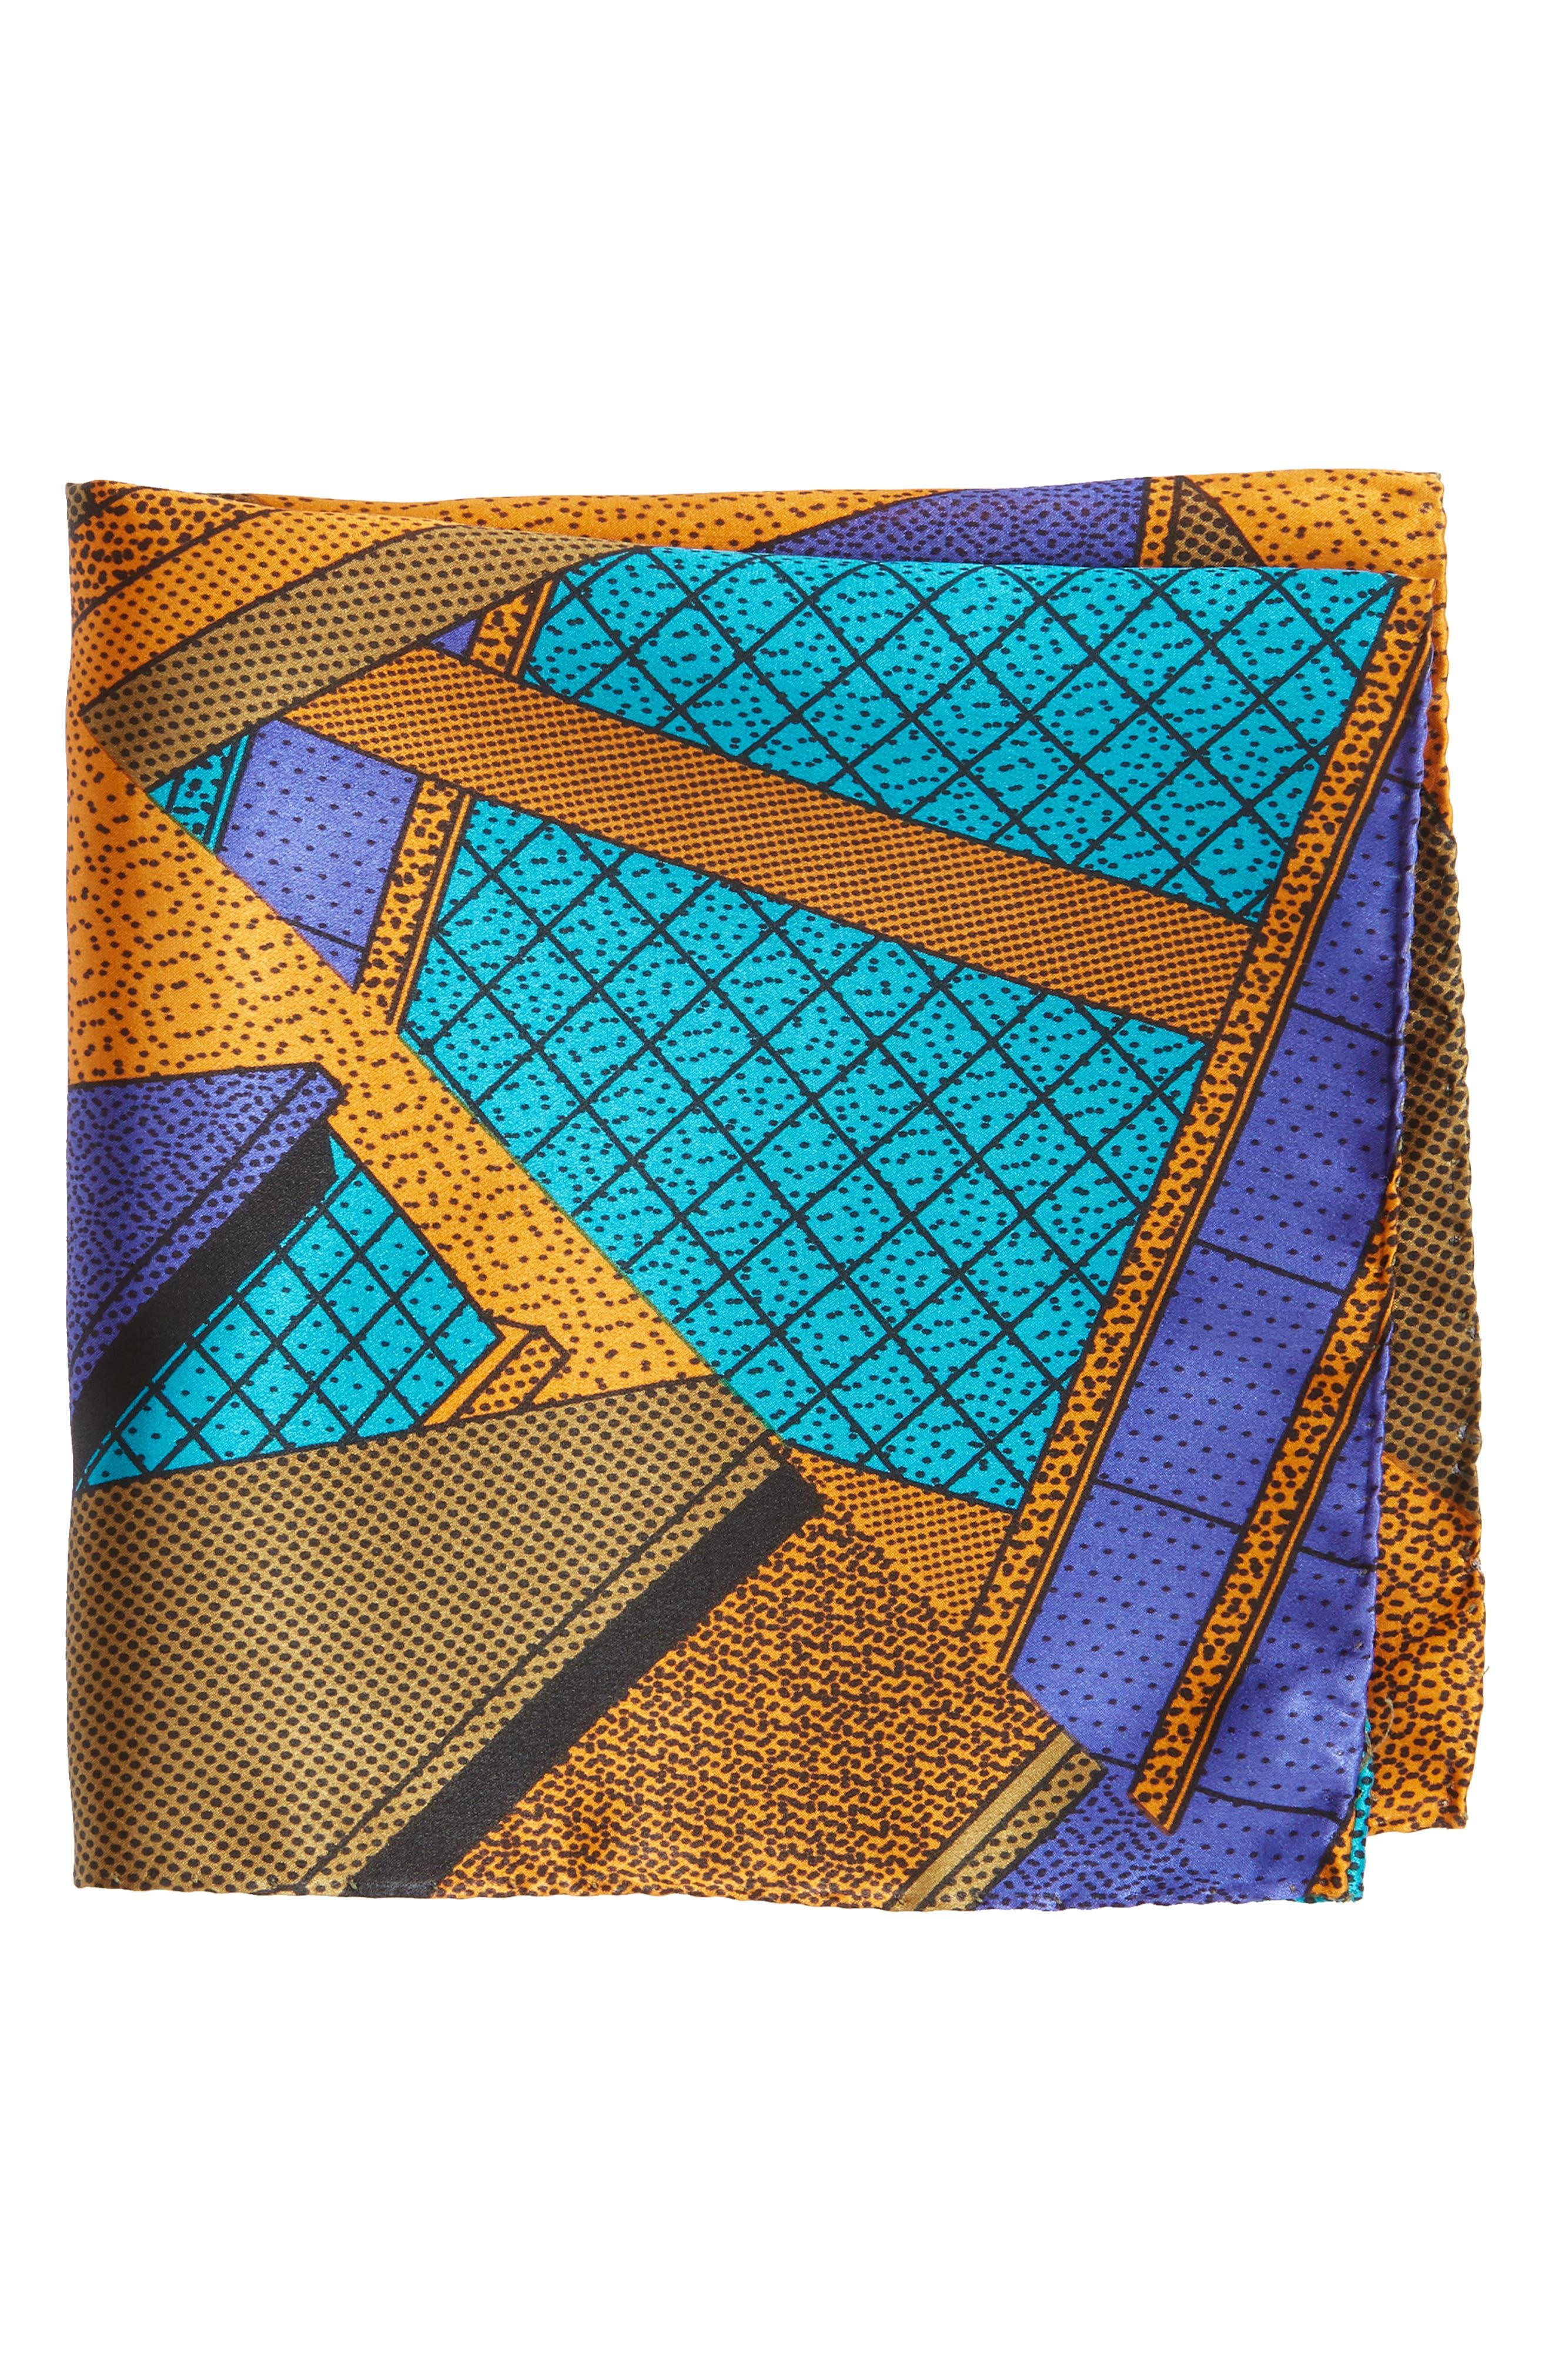 MEMPHIS Milano Pochette Silk Pocket Square,                             Main thumbnail 1, color,                             TEAL/ ORANGE